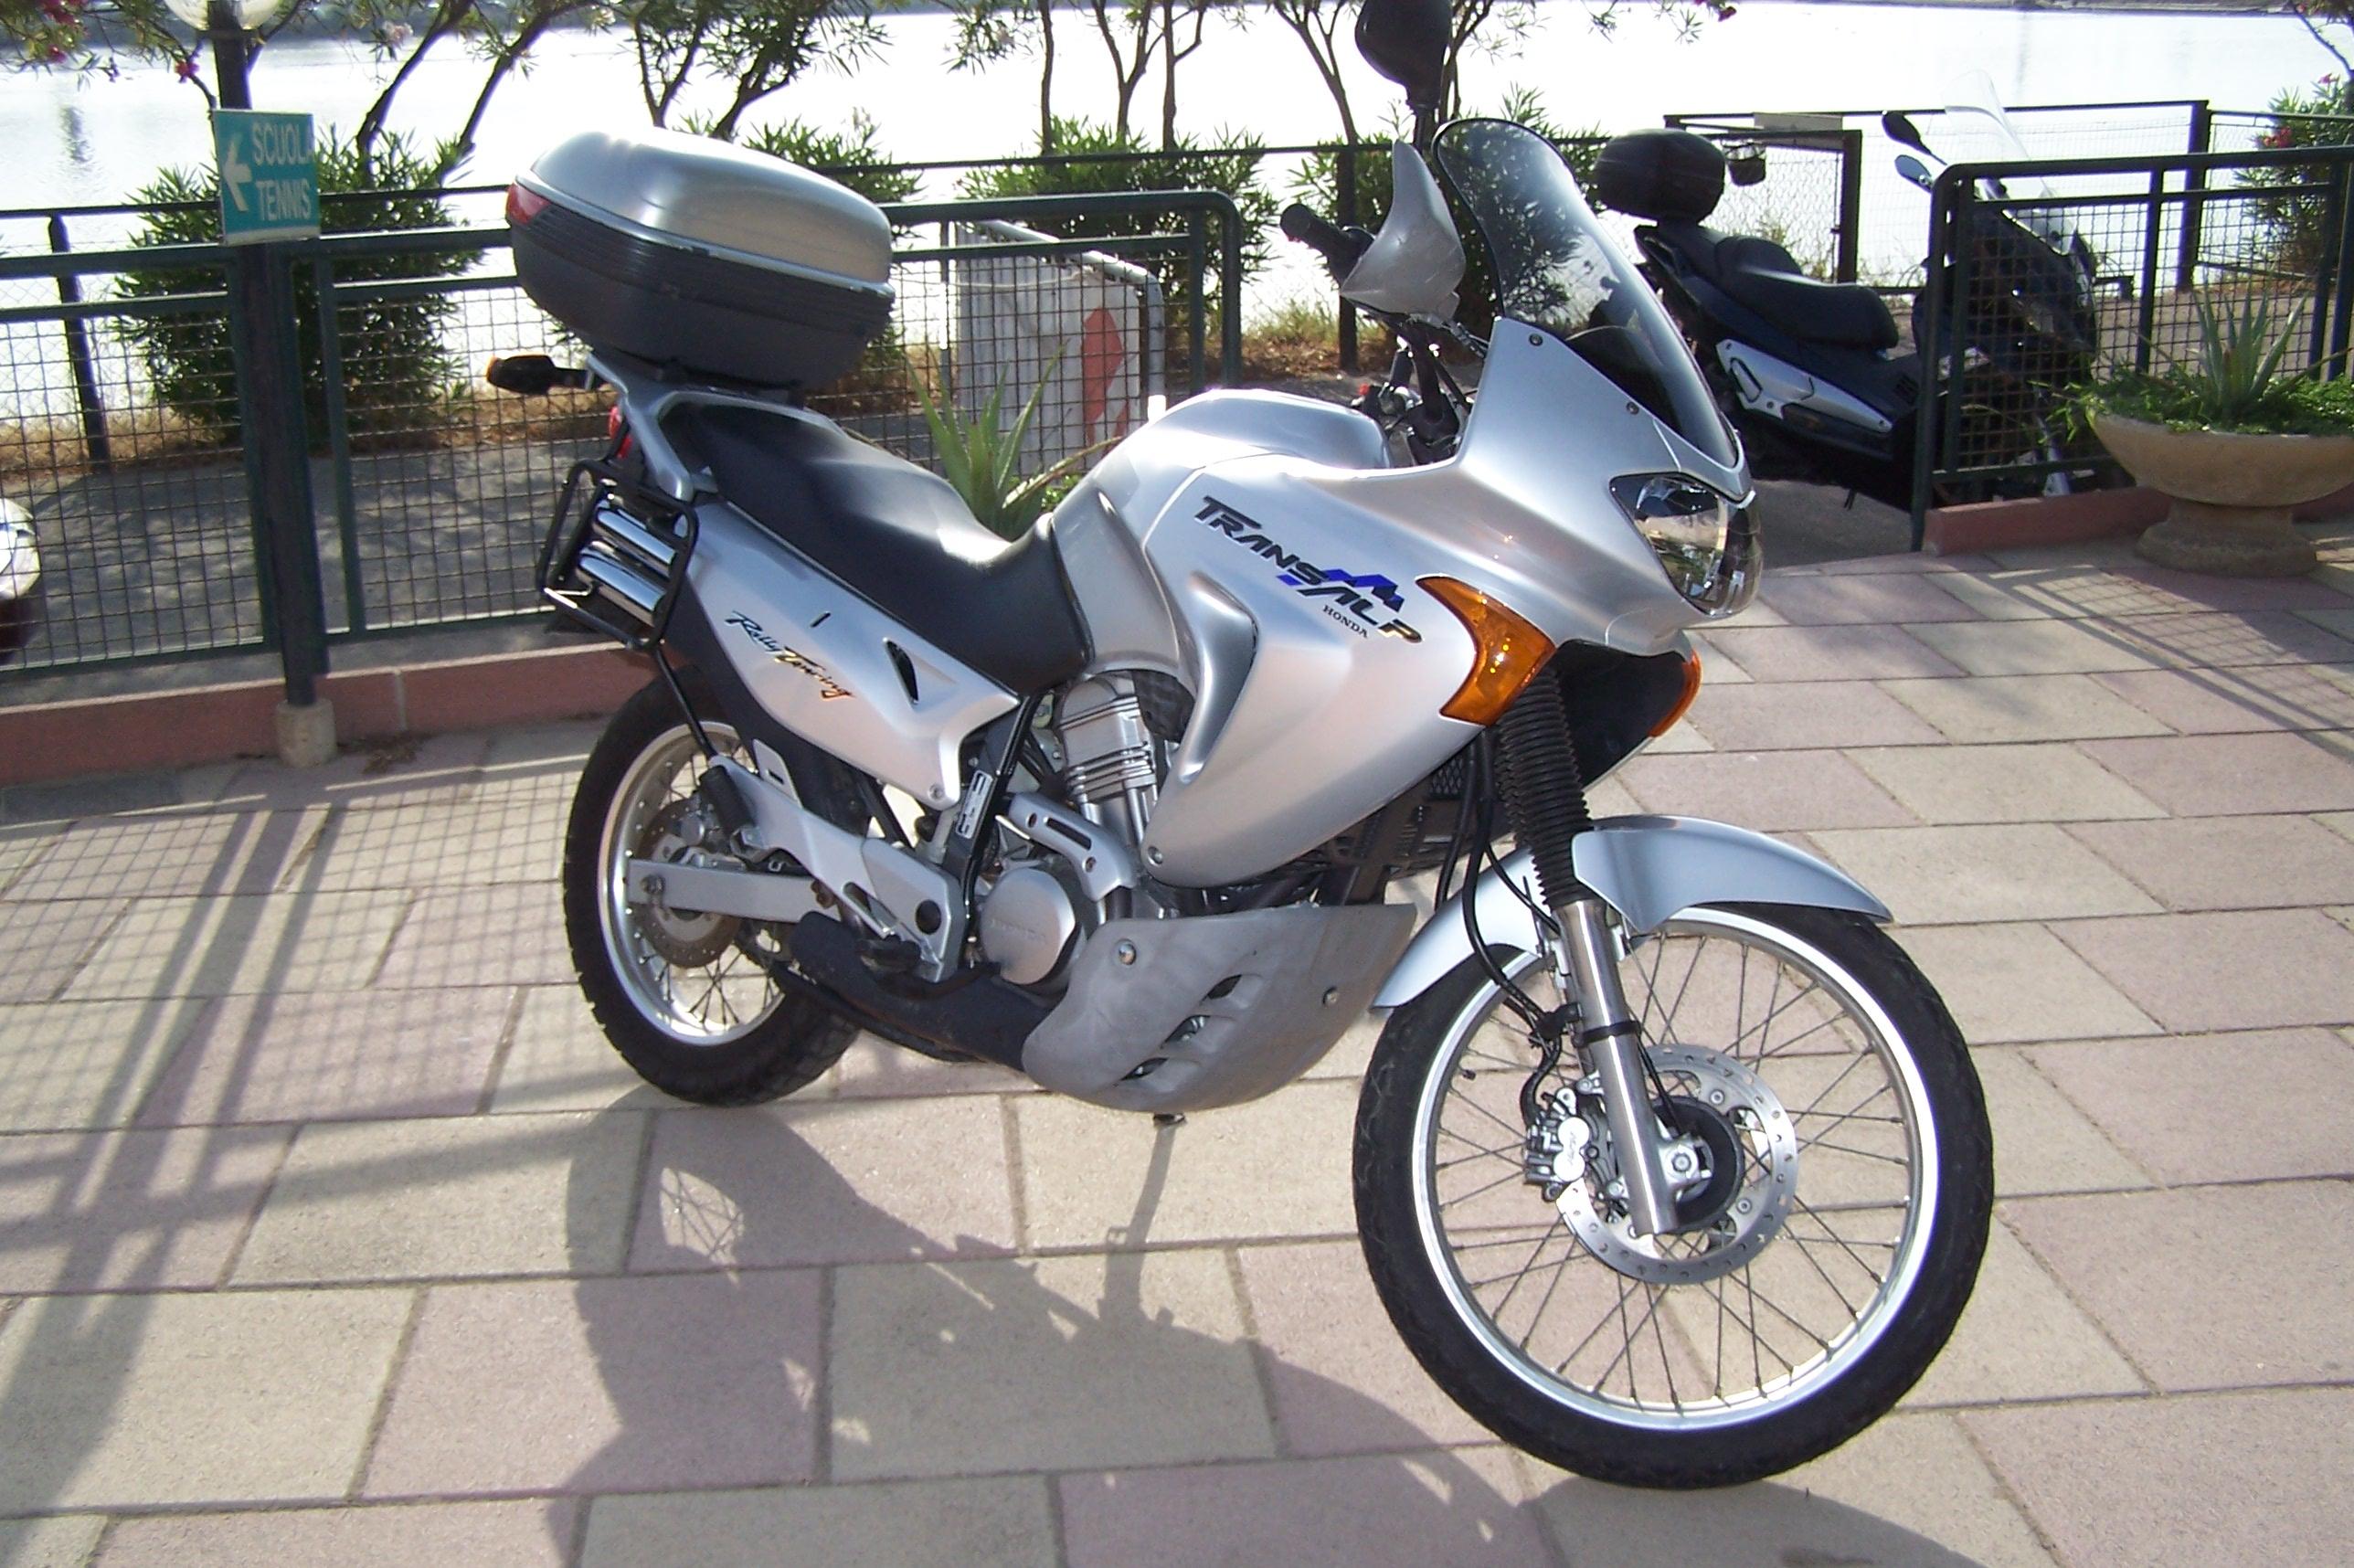 Prova Honda Transalp Xl 650 V 2000 2006 Insellait